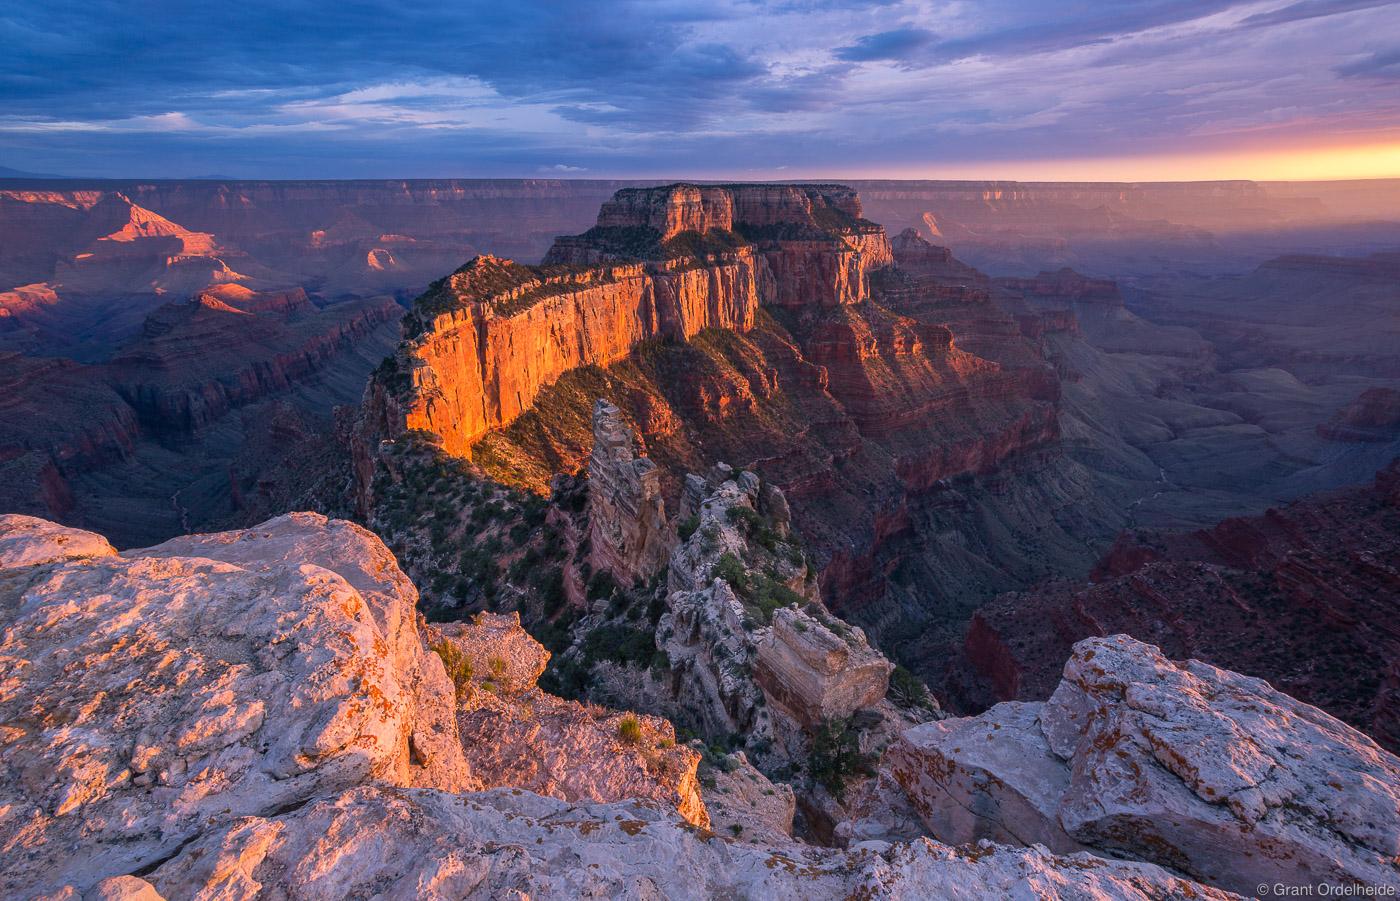 cape, royal, grand, canyon, national, park, arizona, usa, sunset, popular, viewpoint, north, rim, , photo